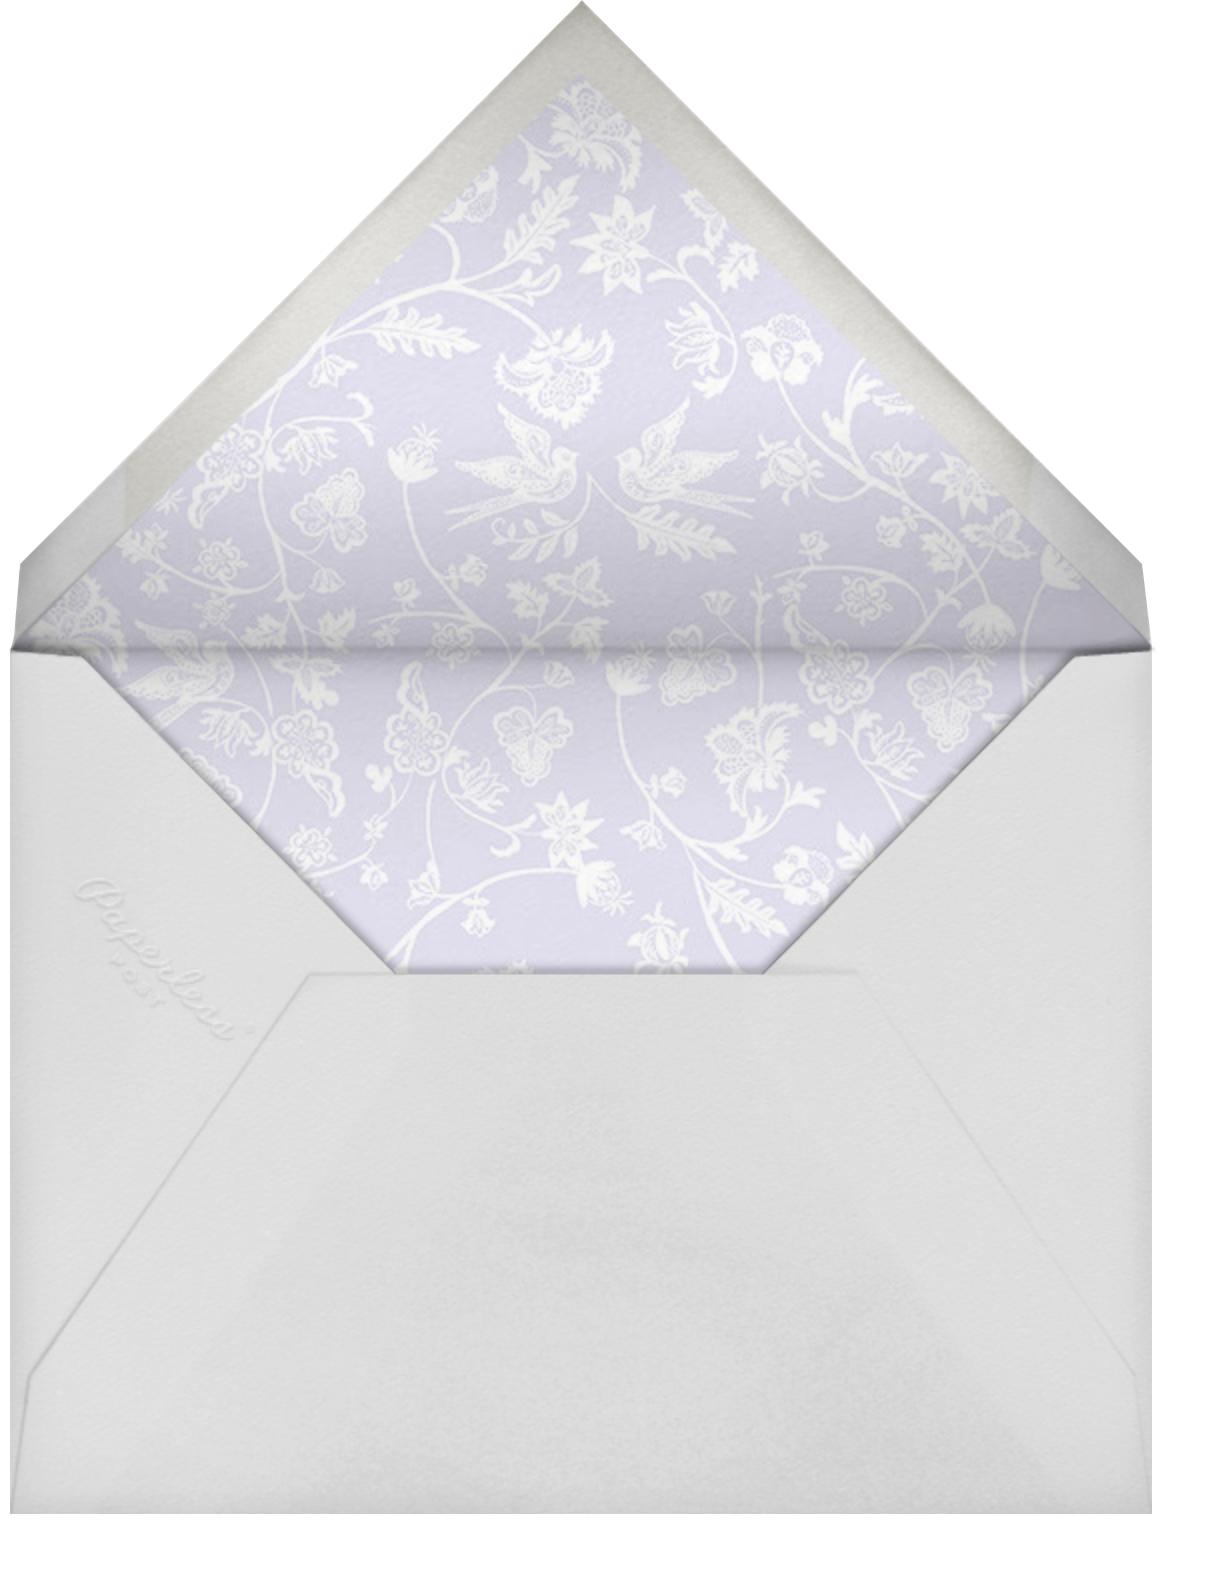 Specimen - Taro - Paperless Post - Envelope